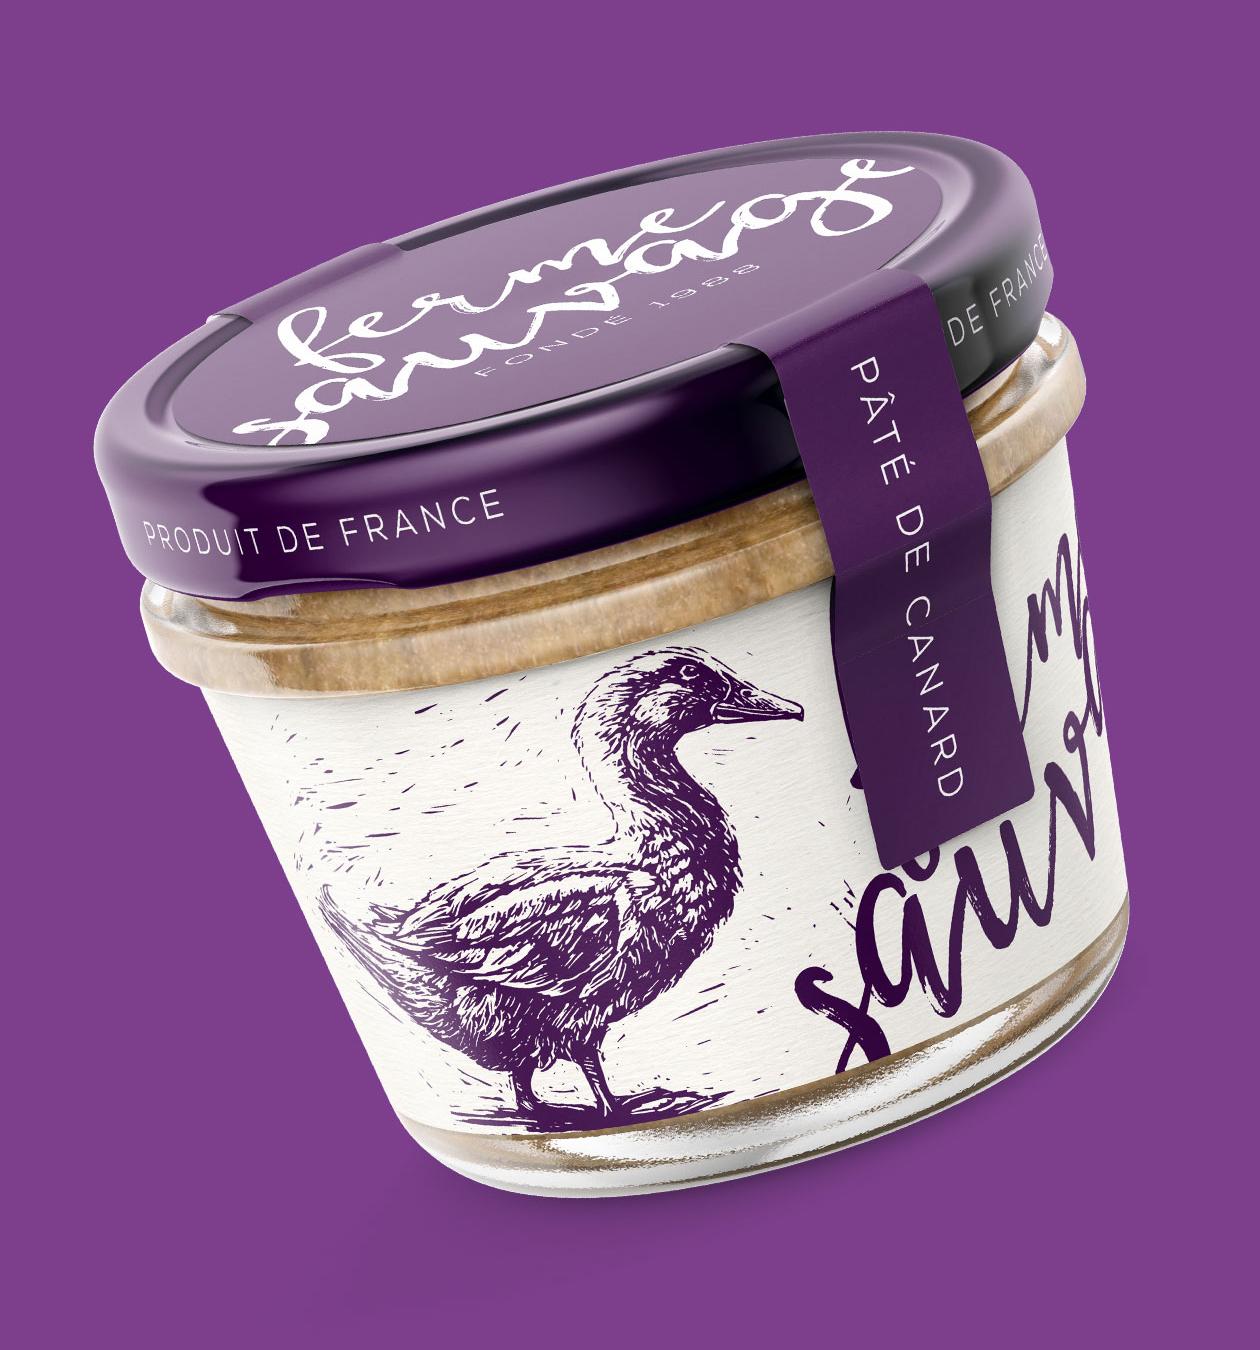 D_ferme-sauvage-packaging-pate-maison_2.jpg